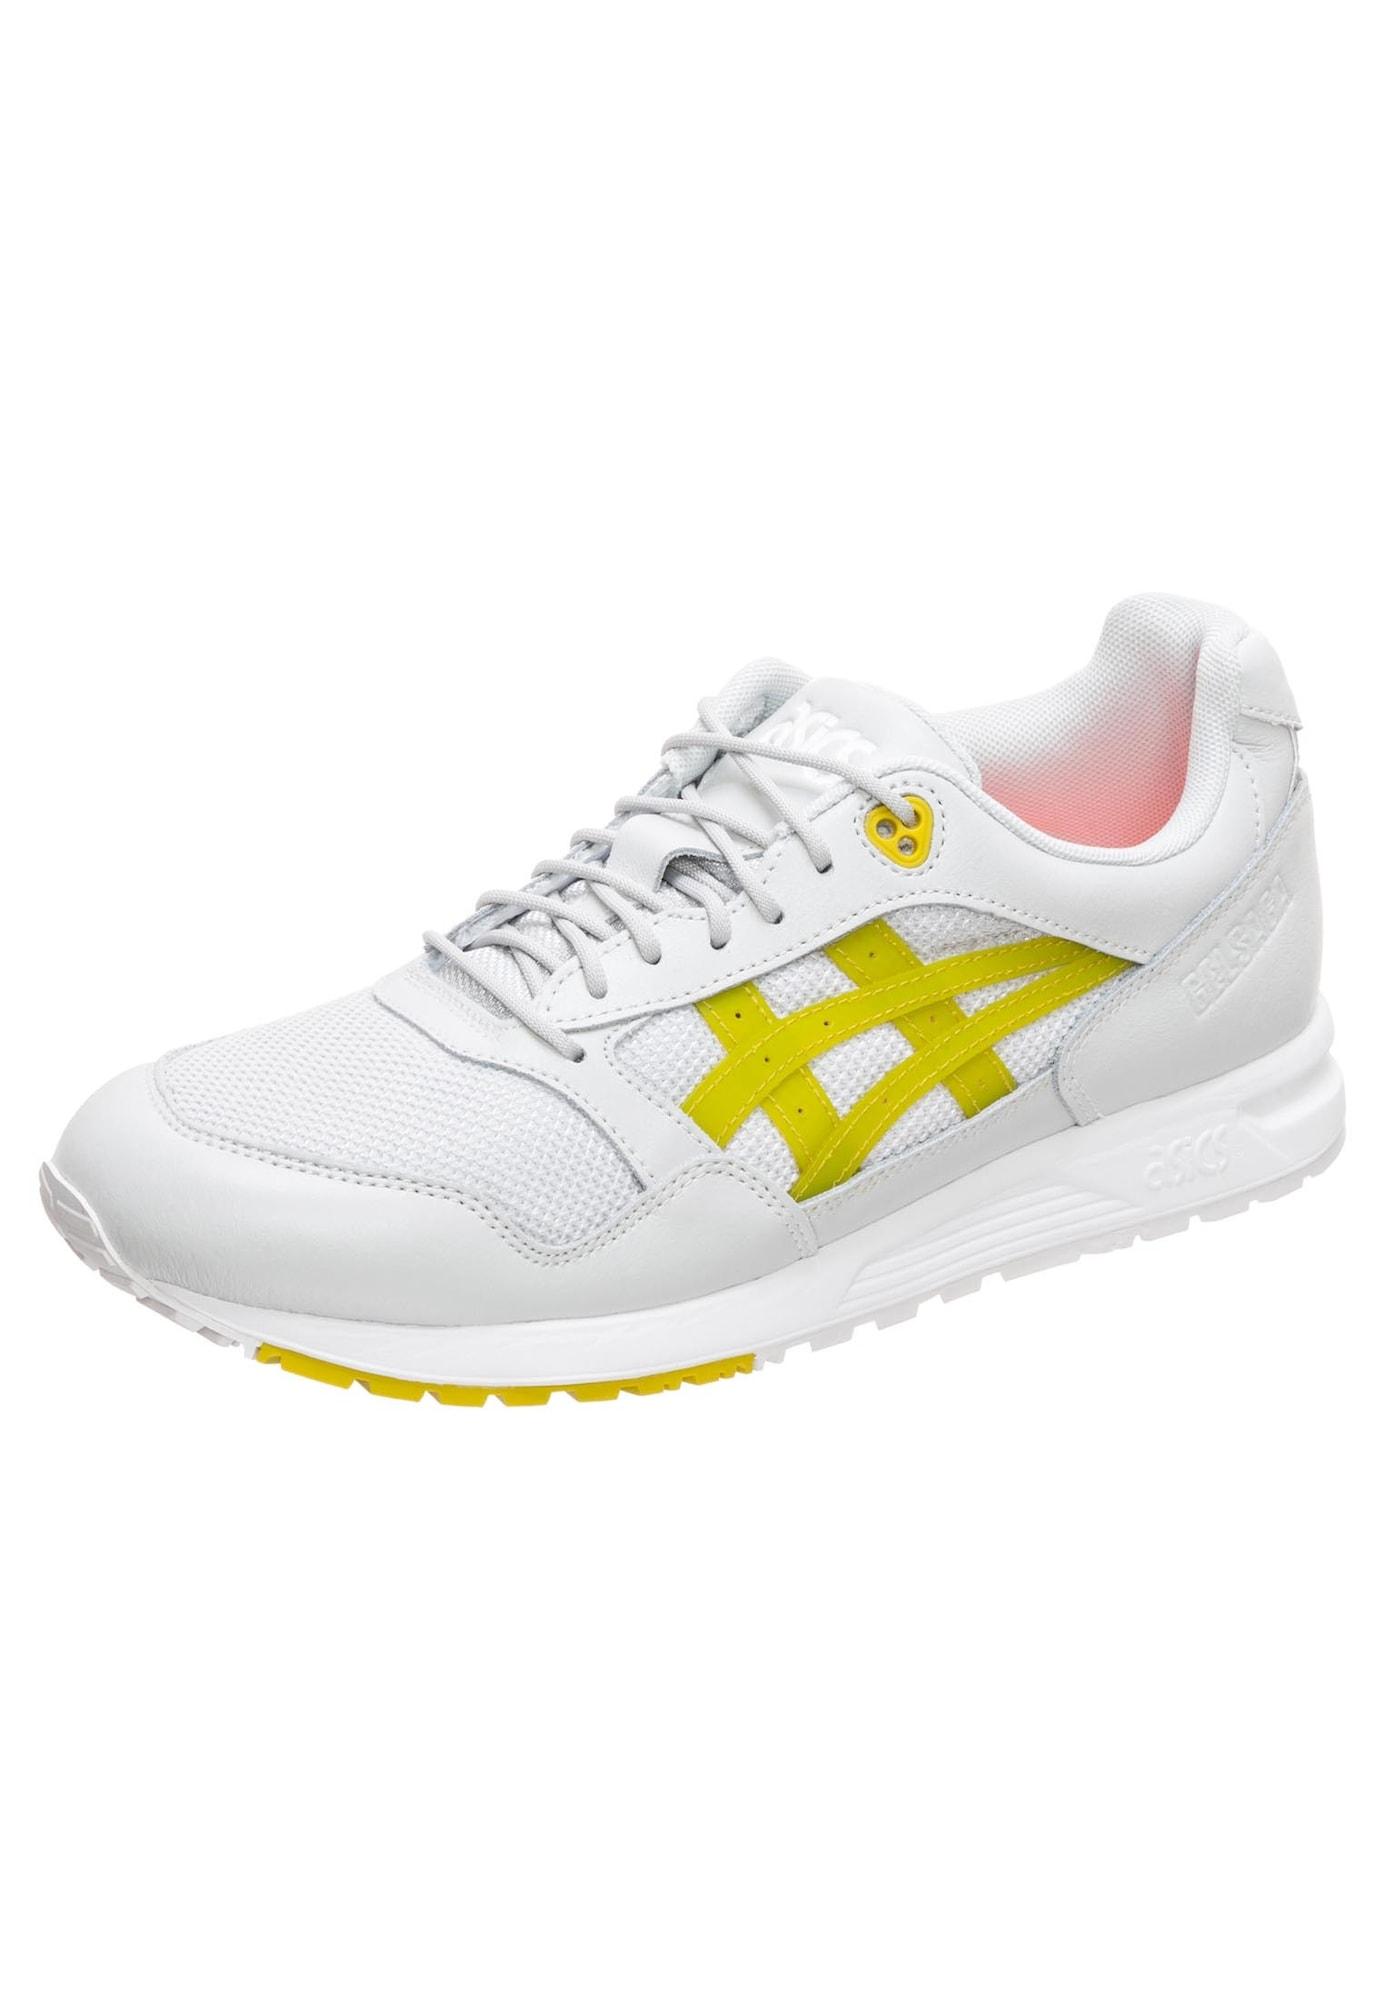 imwalking | SALE Damen Kappa Sneaker HOVER | 04056142354248